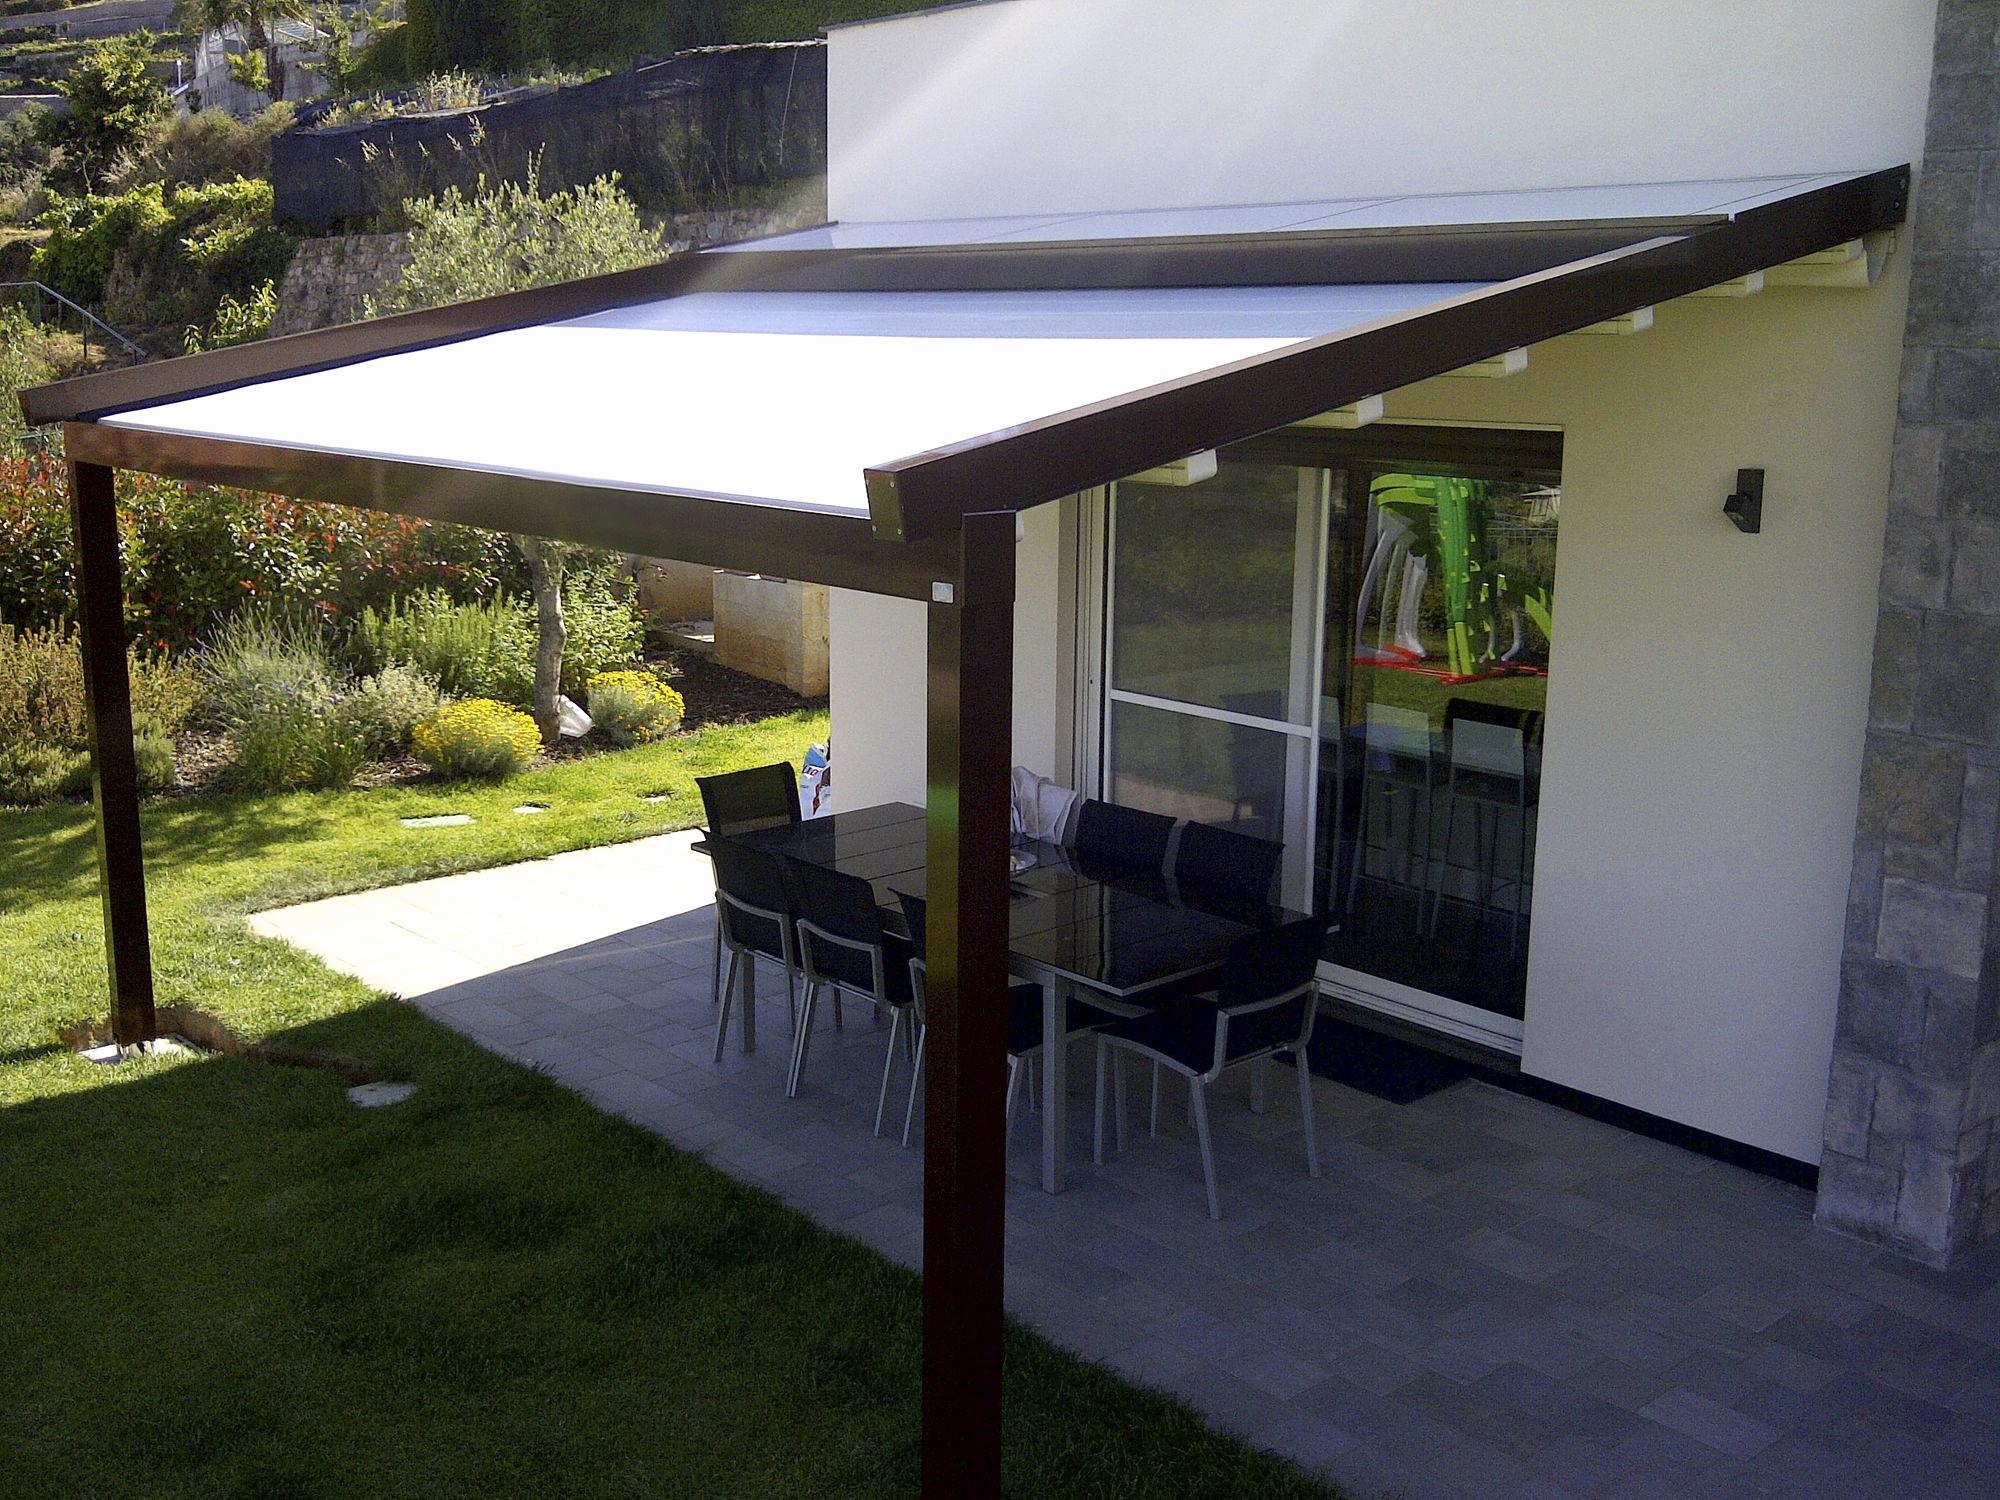 Bordure De Jardin Castorama Meilleur De Photographie Bordure En Bois Jardin Pour Glorieux Parasol Jardin Elegante toile